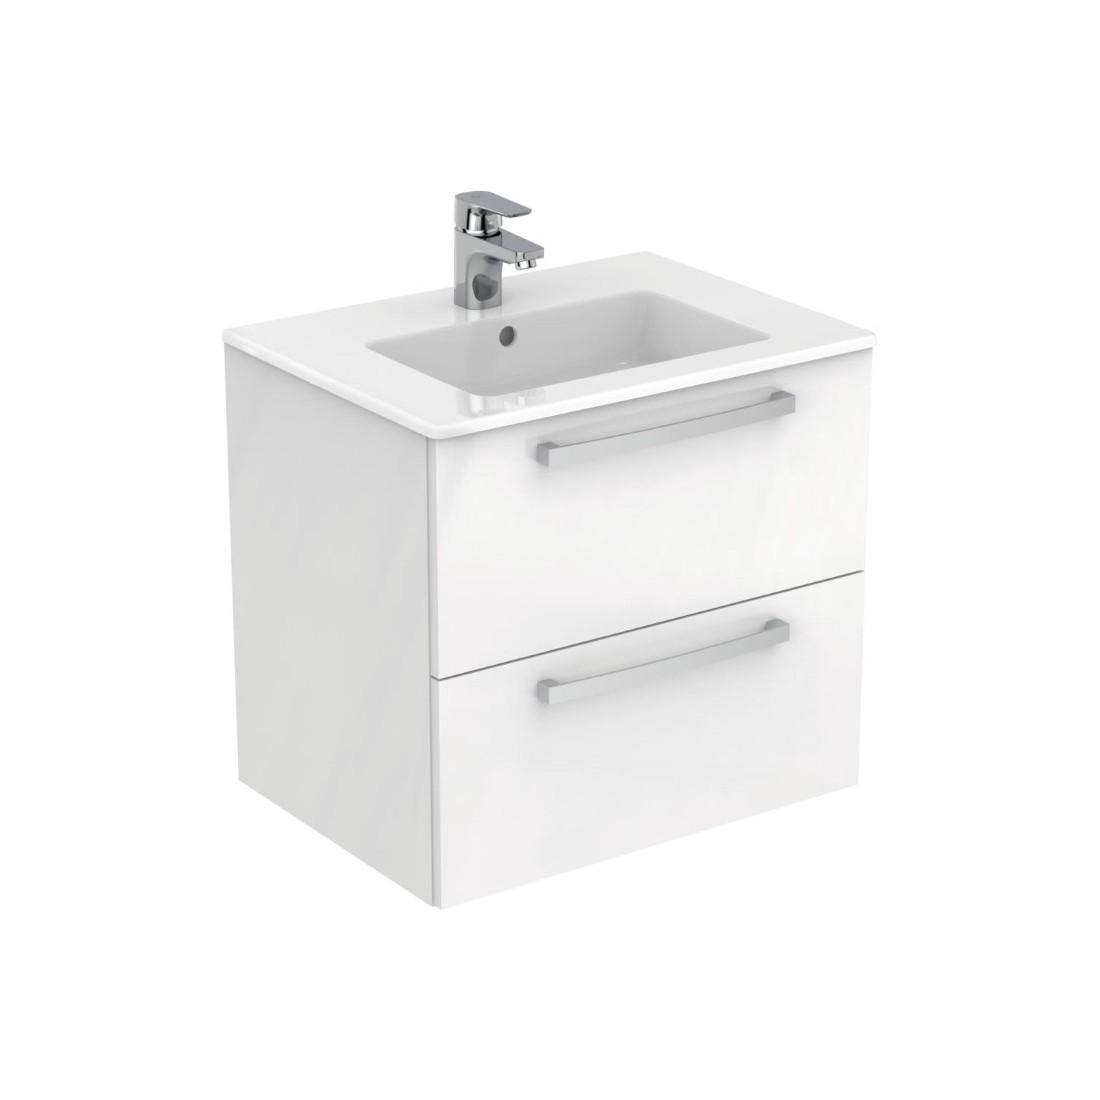 Vonios spintelė IDEAL STANDARD, TEMPO 60cm.